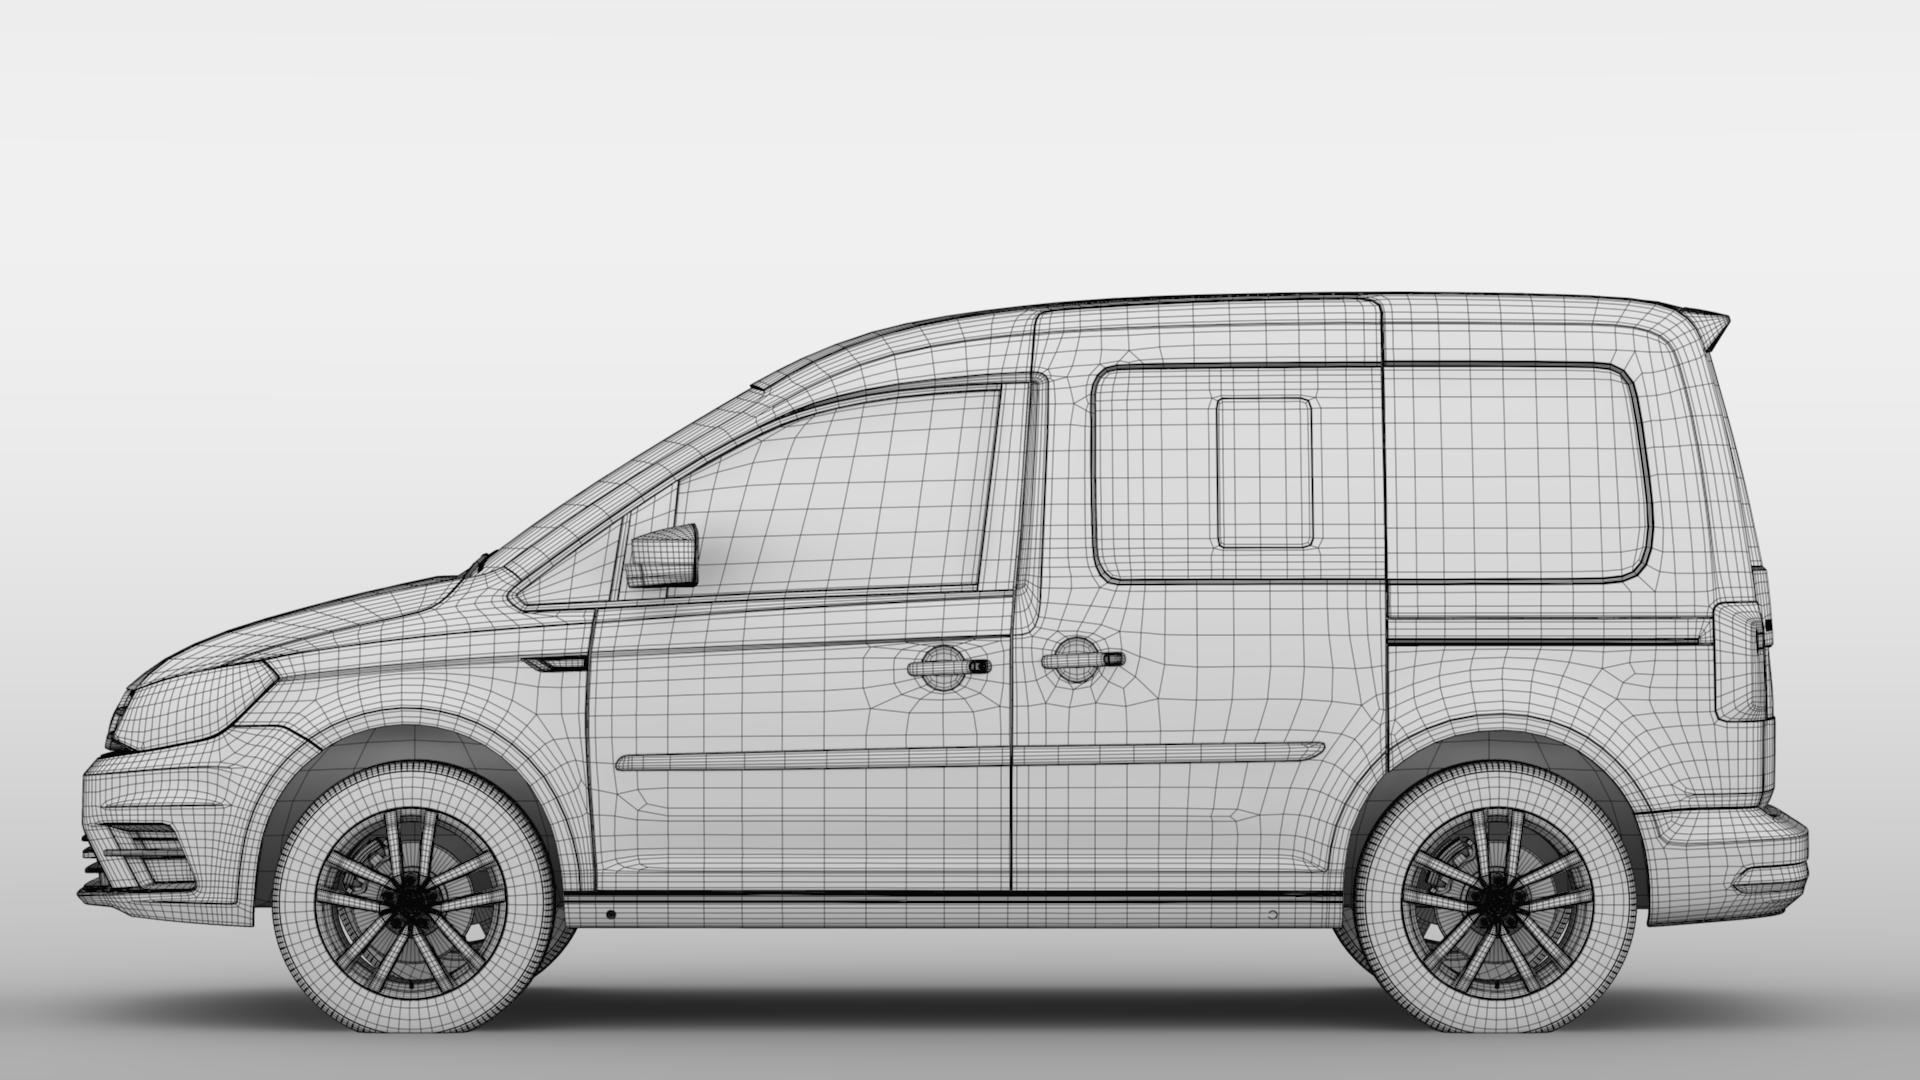 volkswagen caddy 2018 3d model max fbx c4d lwo ma mb hrc xsi obj 283815